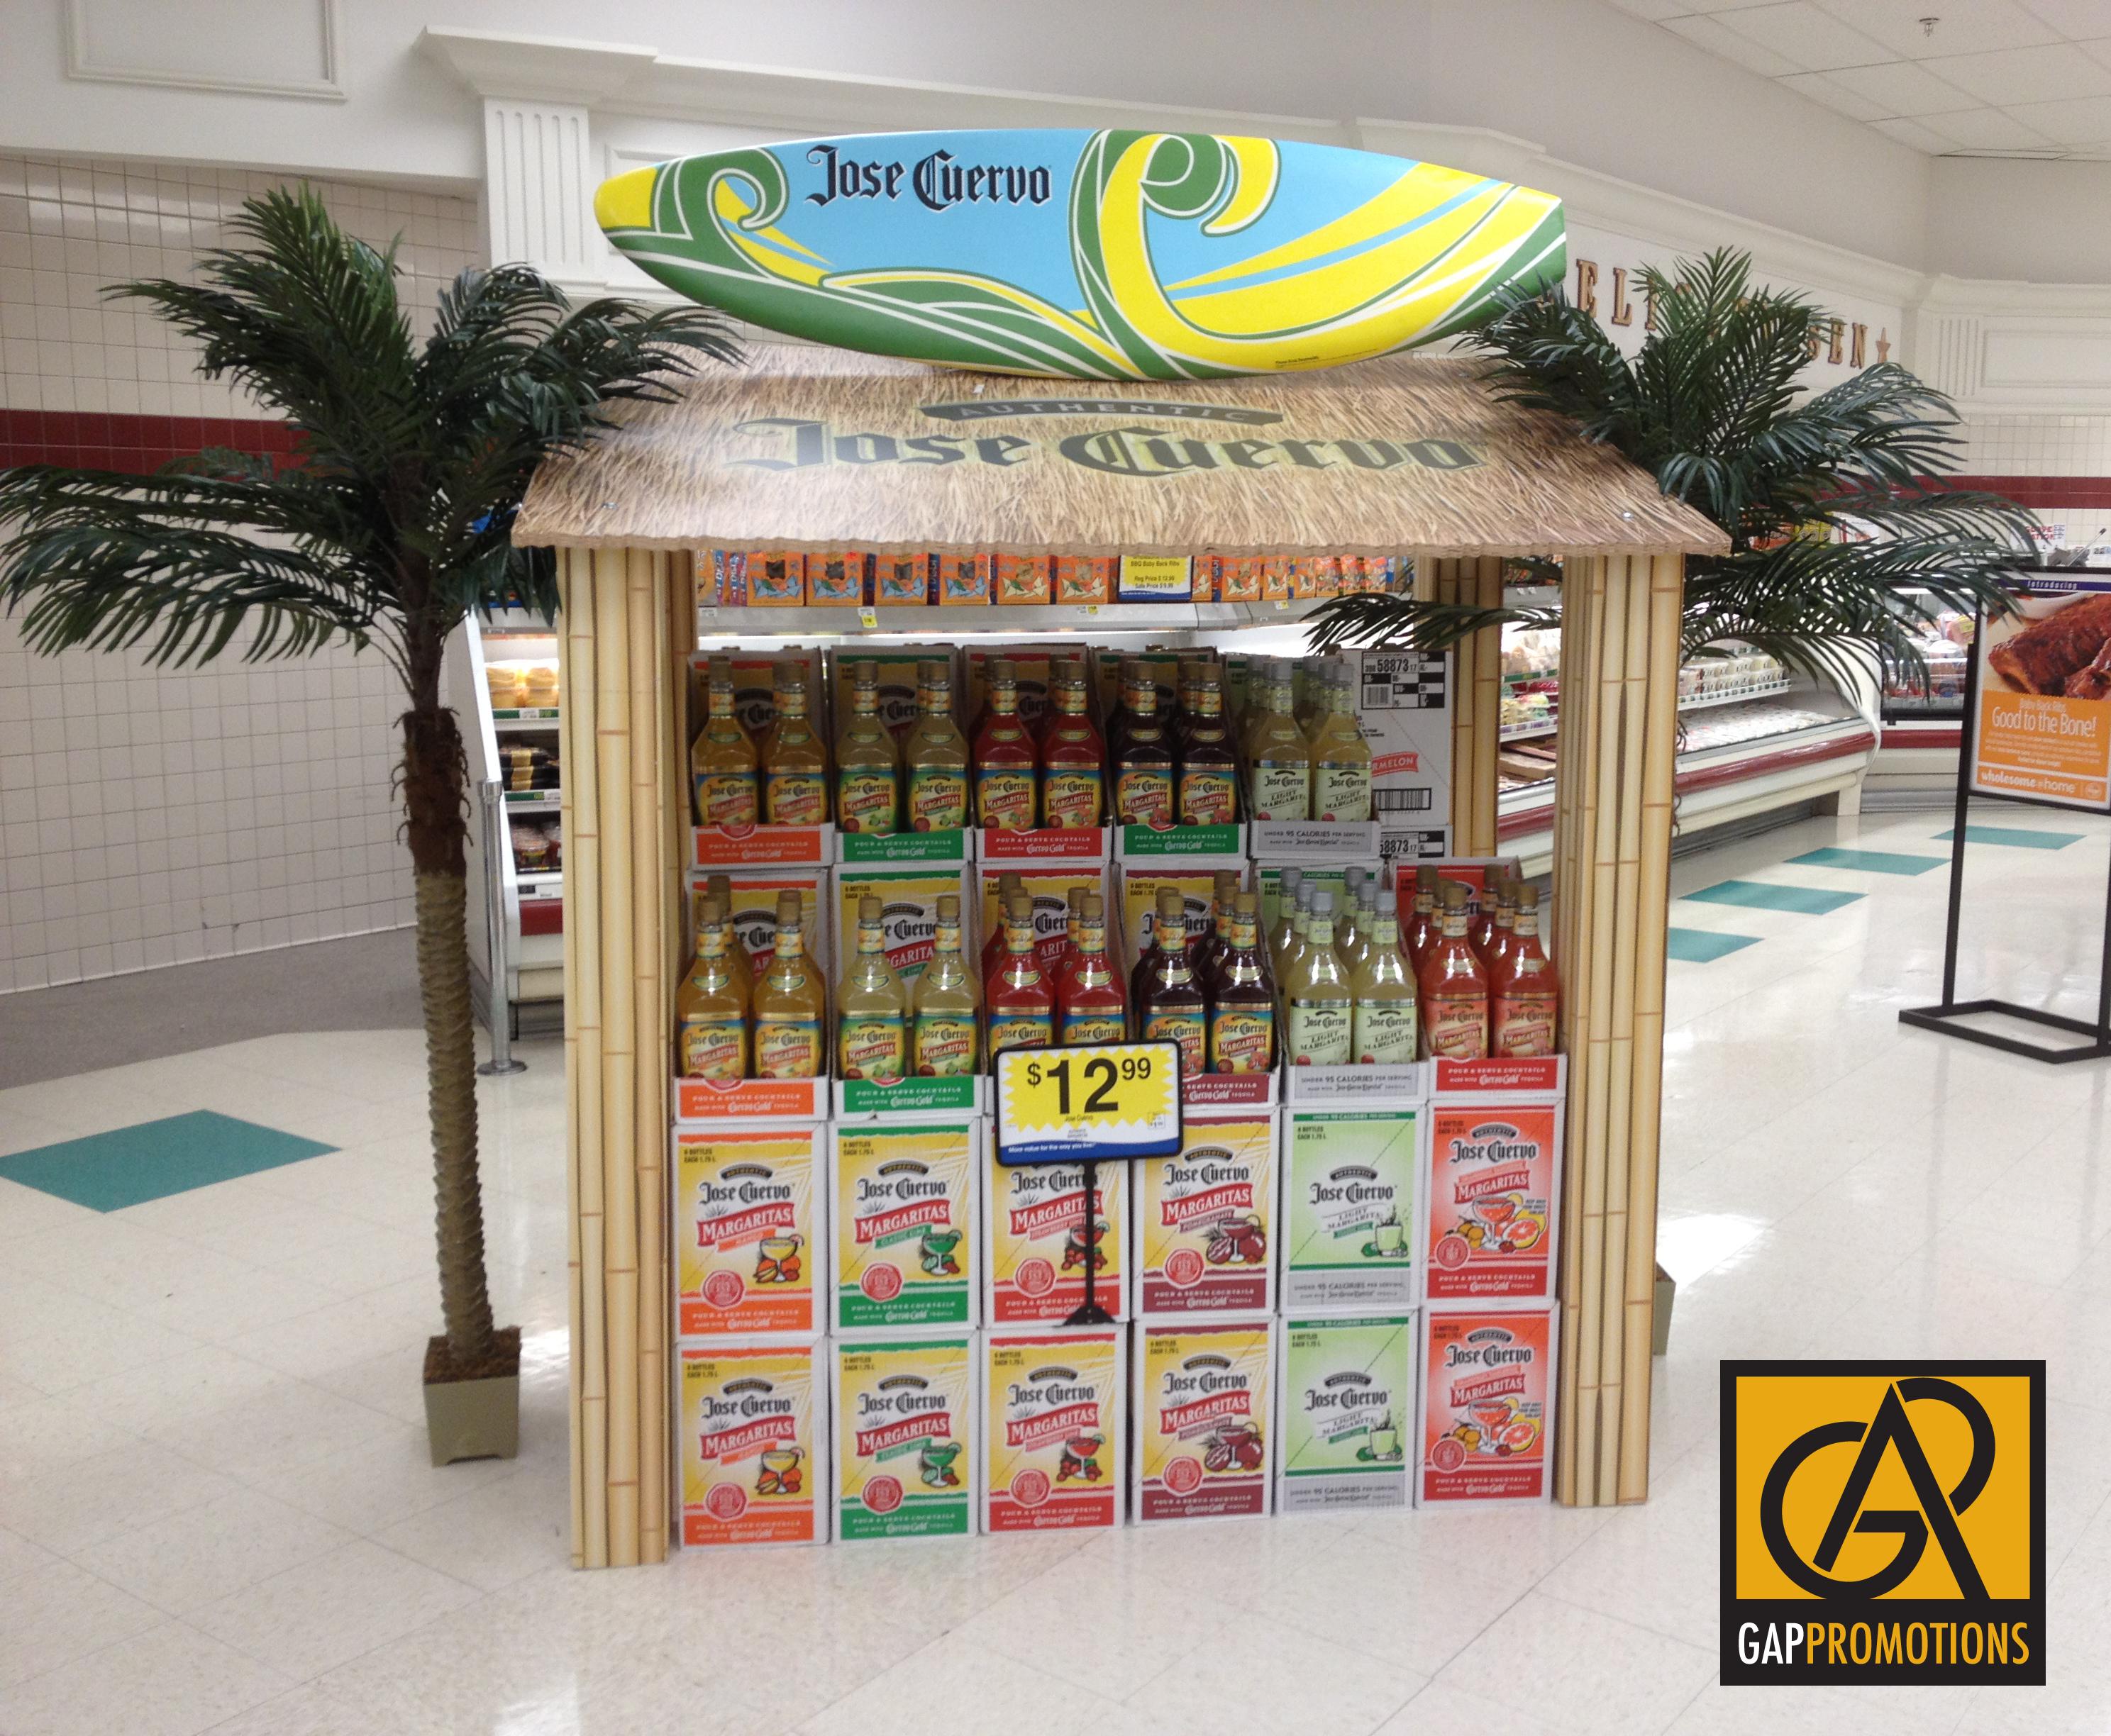 Jose Cuervo Beach Hut Beverage Displays Pos Display